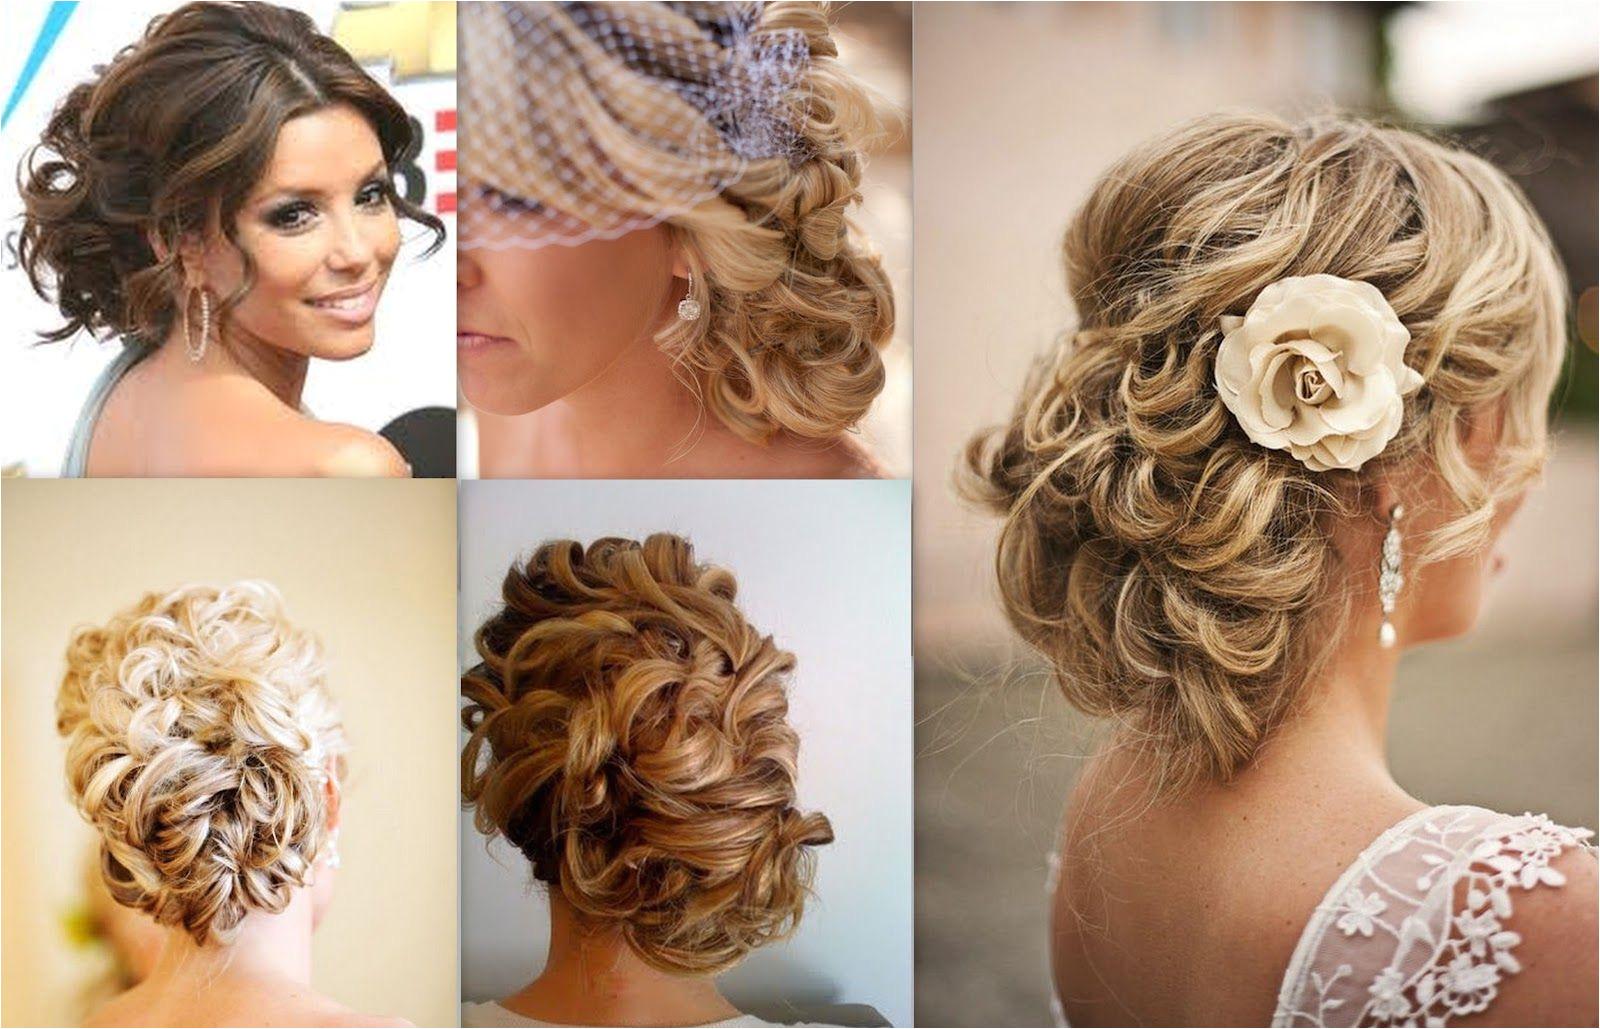 Side Updo Hairstyles For Weddings Updo Wedding Hairstyles Long Hair 10 Bridal…